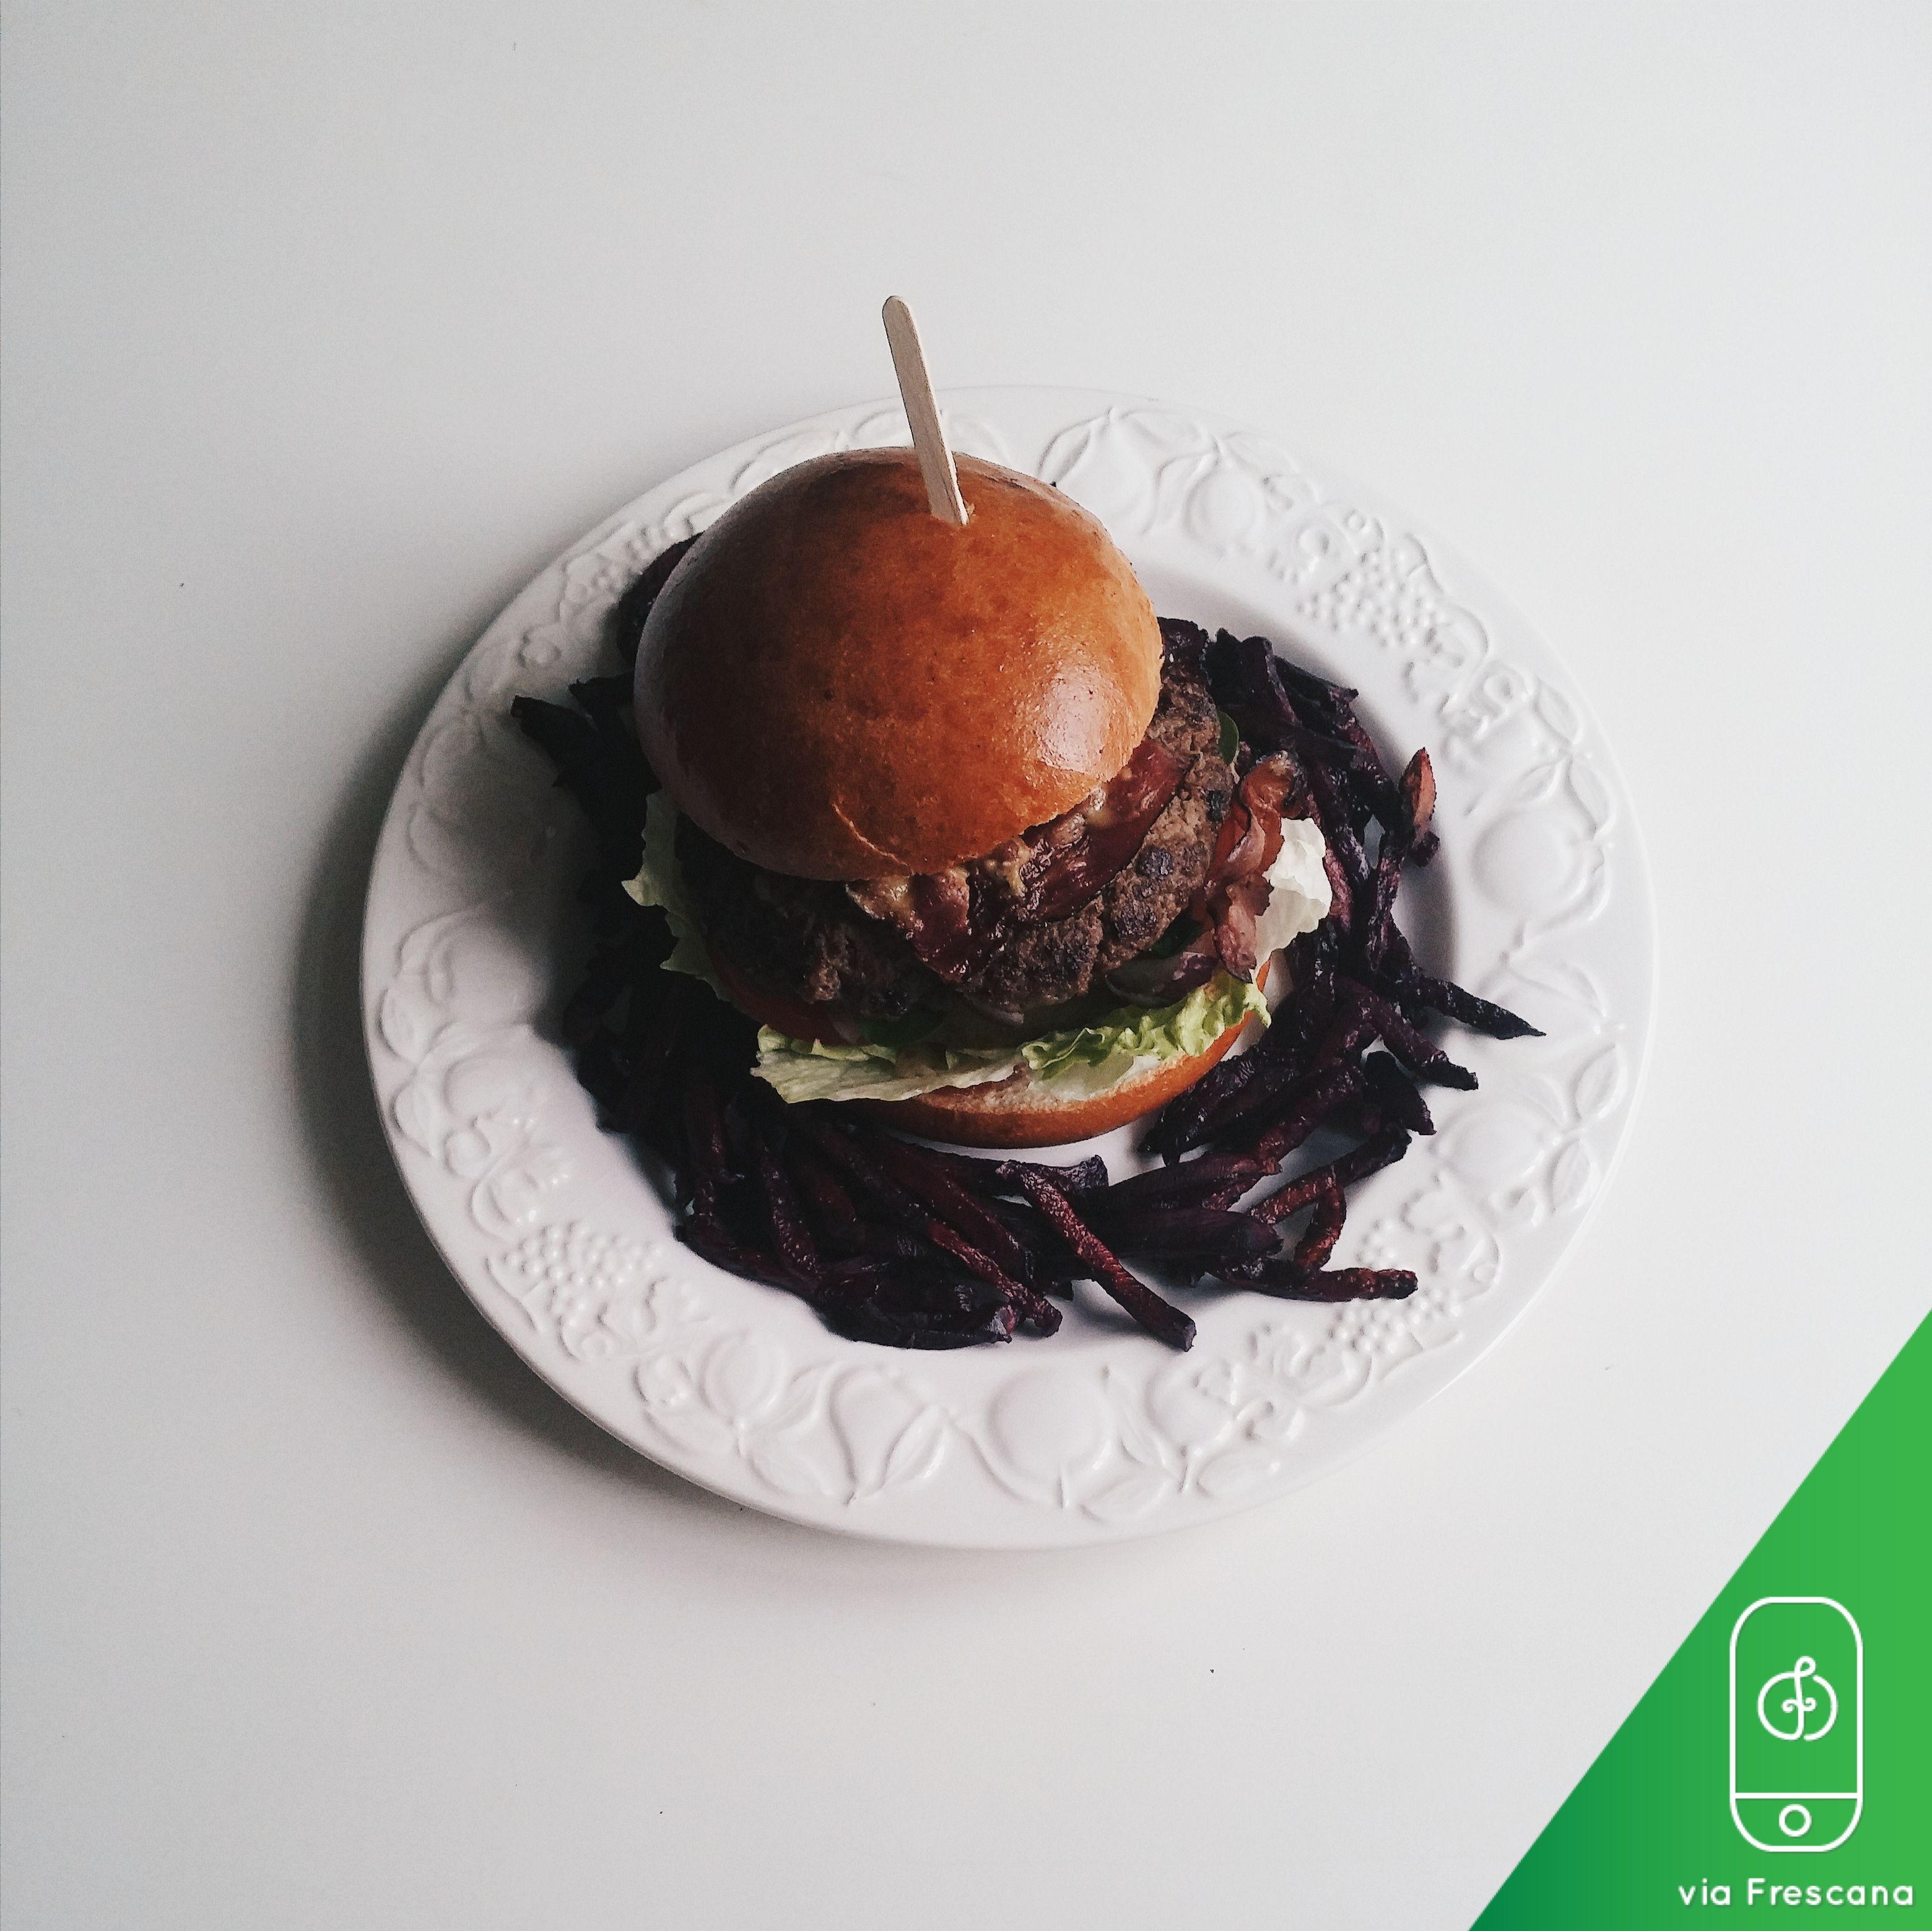 Gourmet Burger    #foodporn #foodie #frescana #foodphotography #foodies #foodlover #foodlovers   #gourmetburger